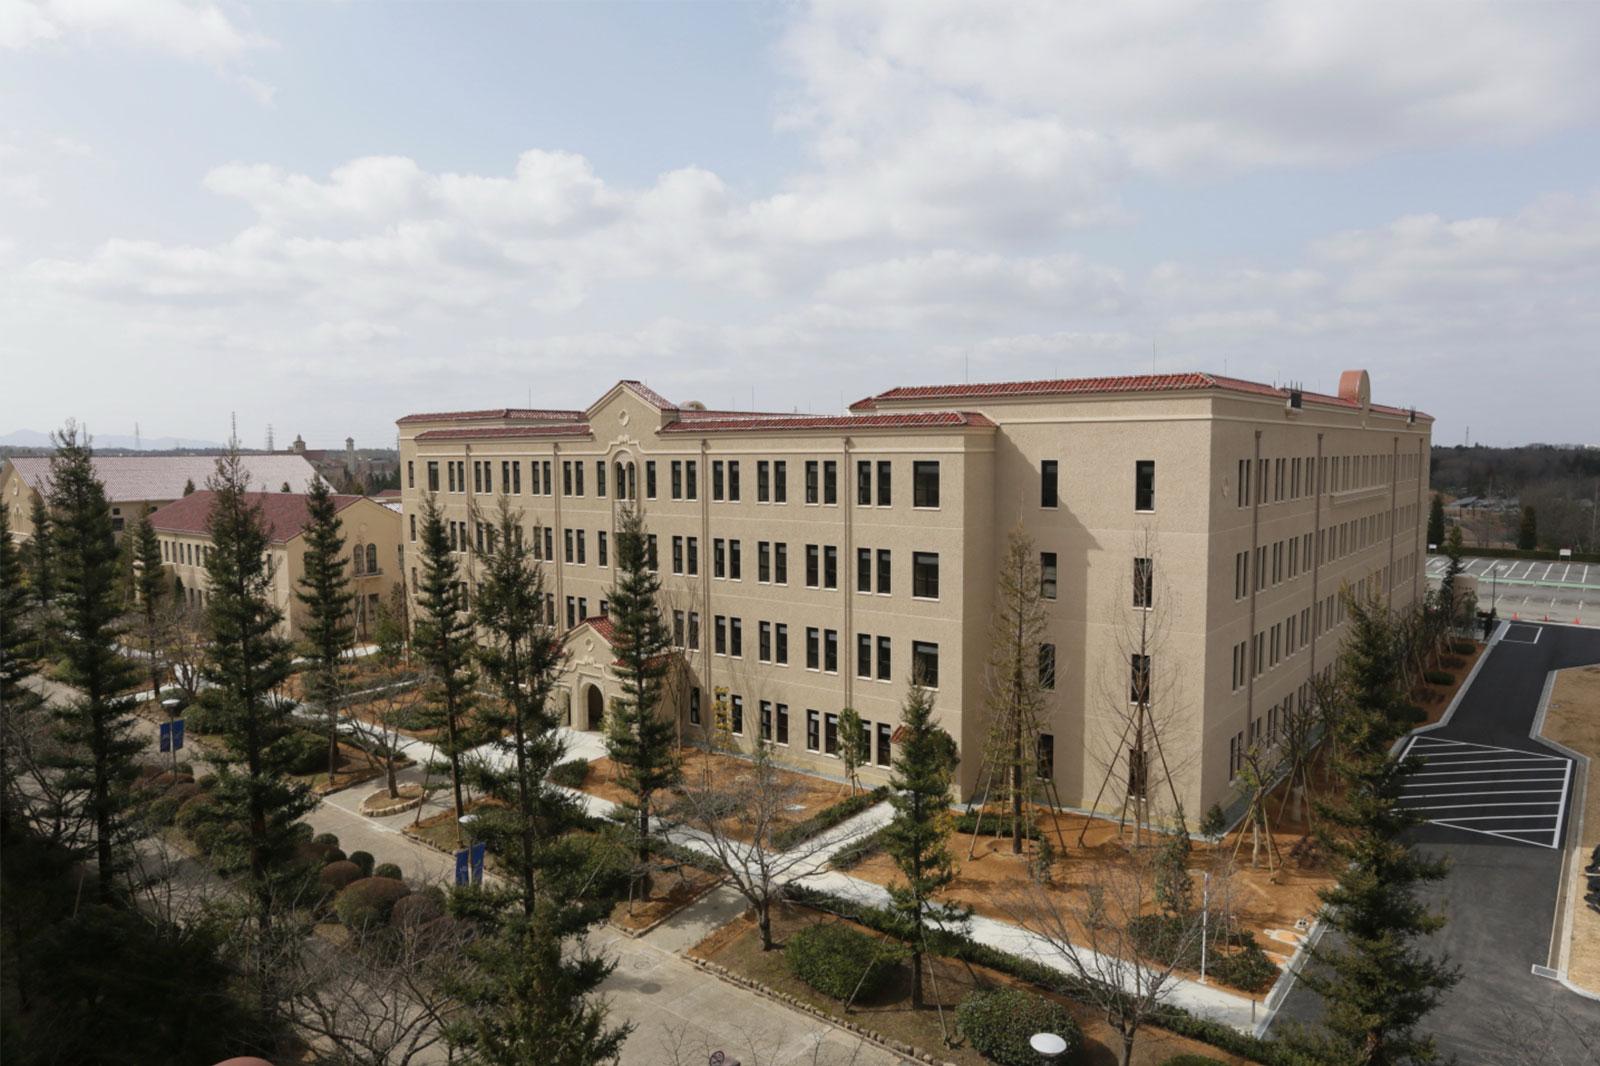 関西学院大学 神戸三田キャンパス Ⅶ号館